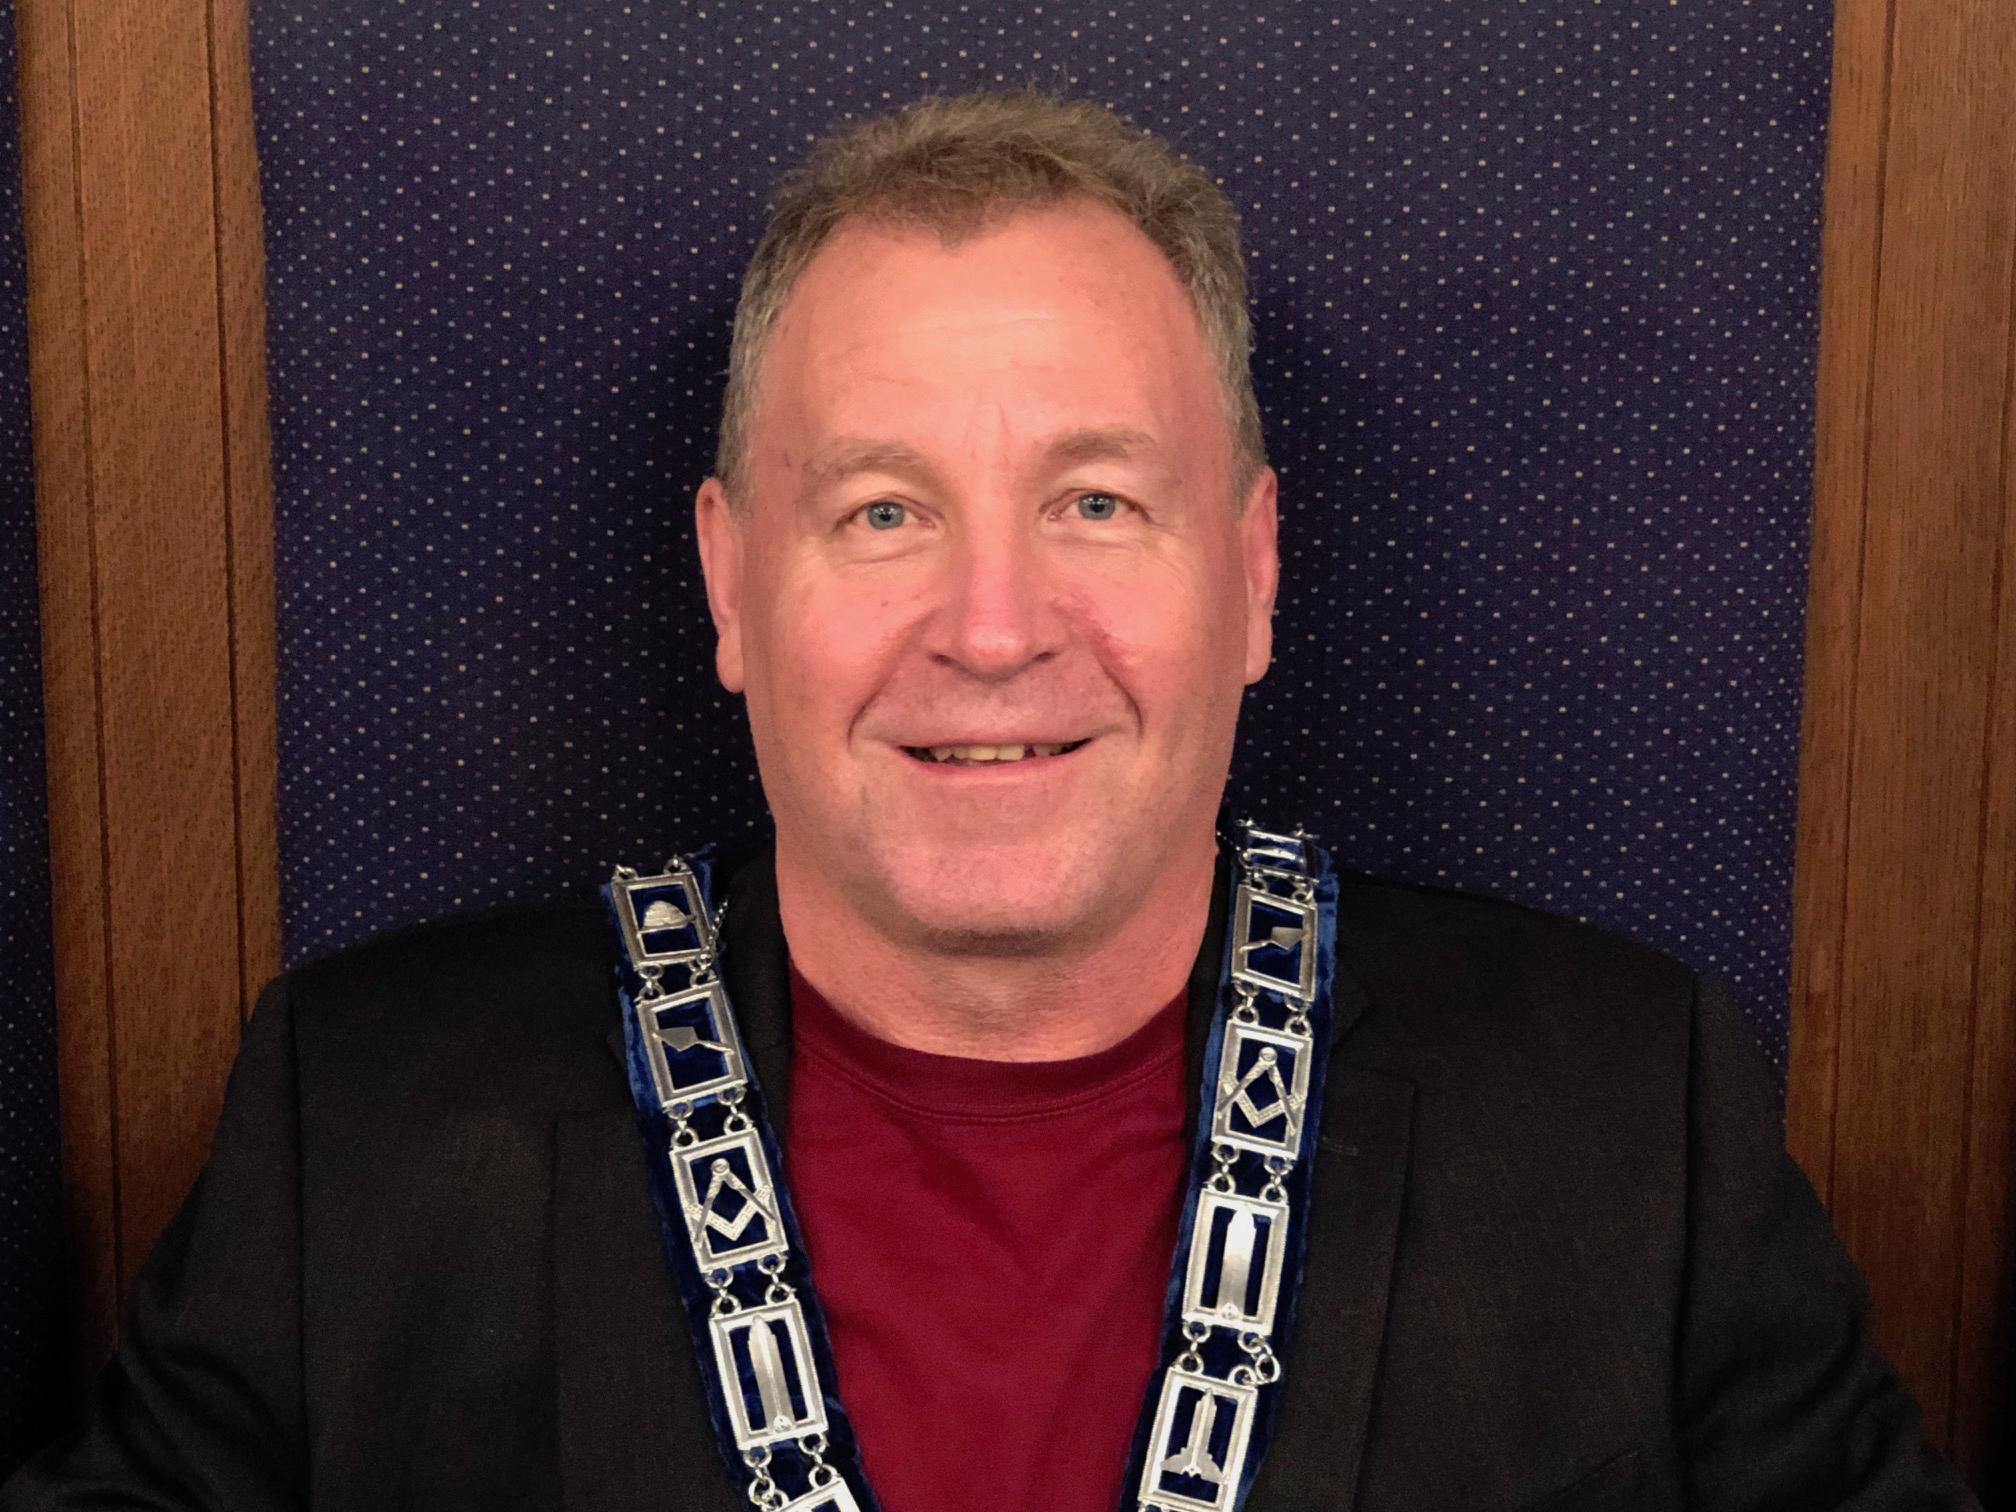 Charles J. Shaw, Jr. - Assistant Secretary